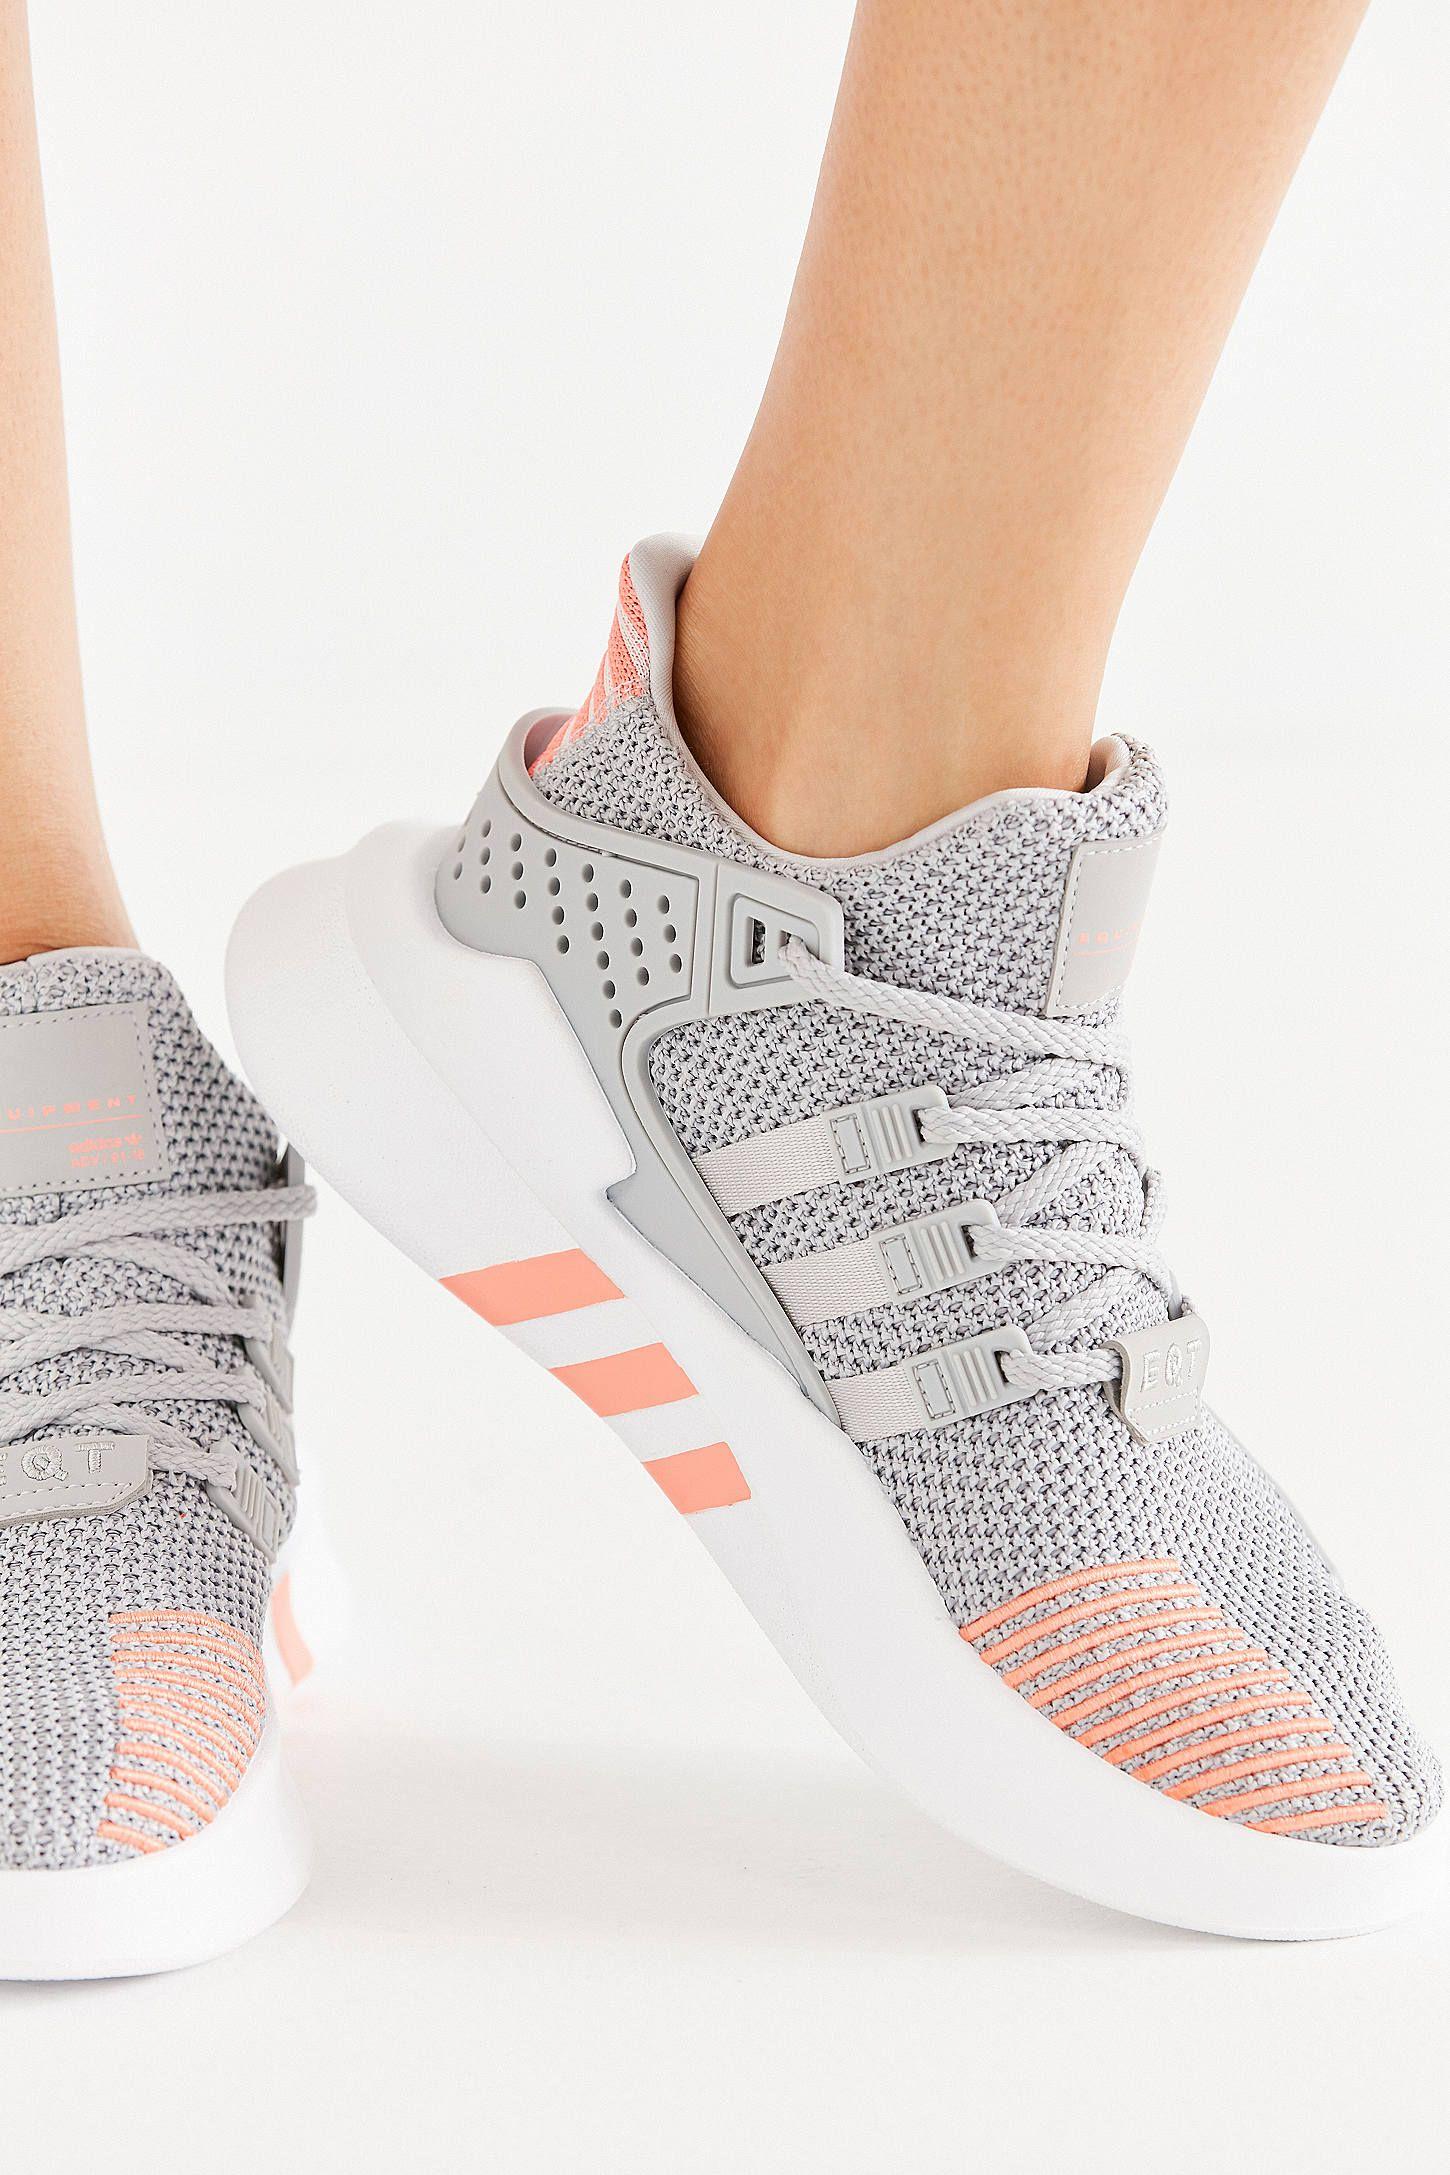 adidas originali eqt basket avanzata scarpe adidas, urban